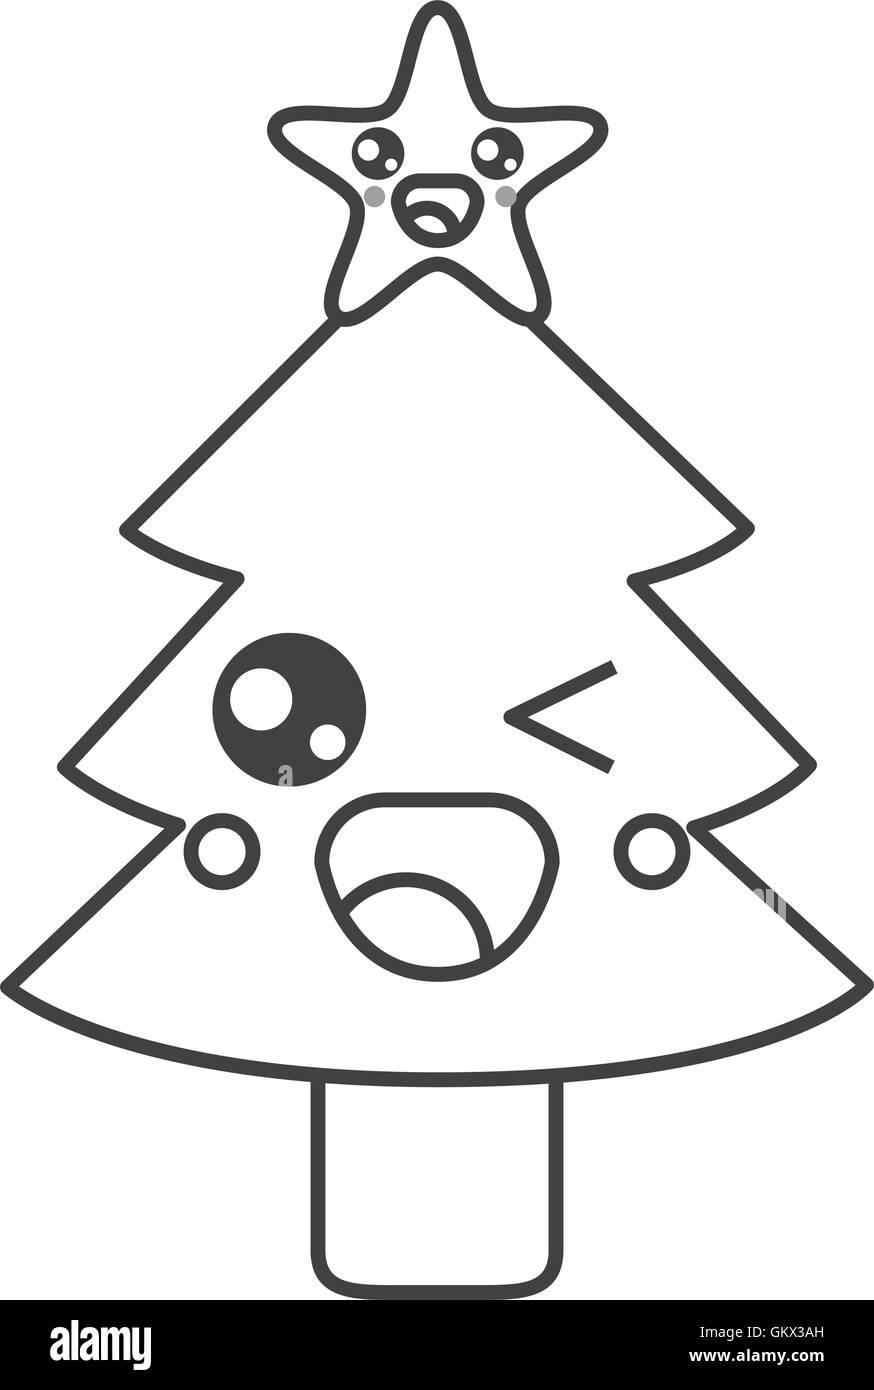 Adorable Cartoon Christmas Kawaii Tree Black And White Stock Photos